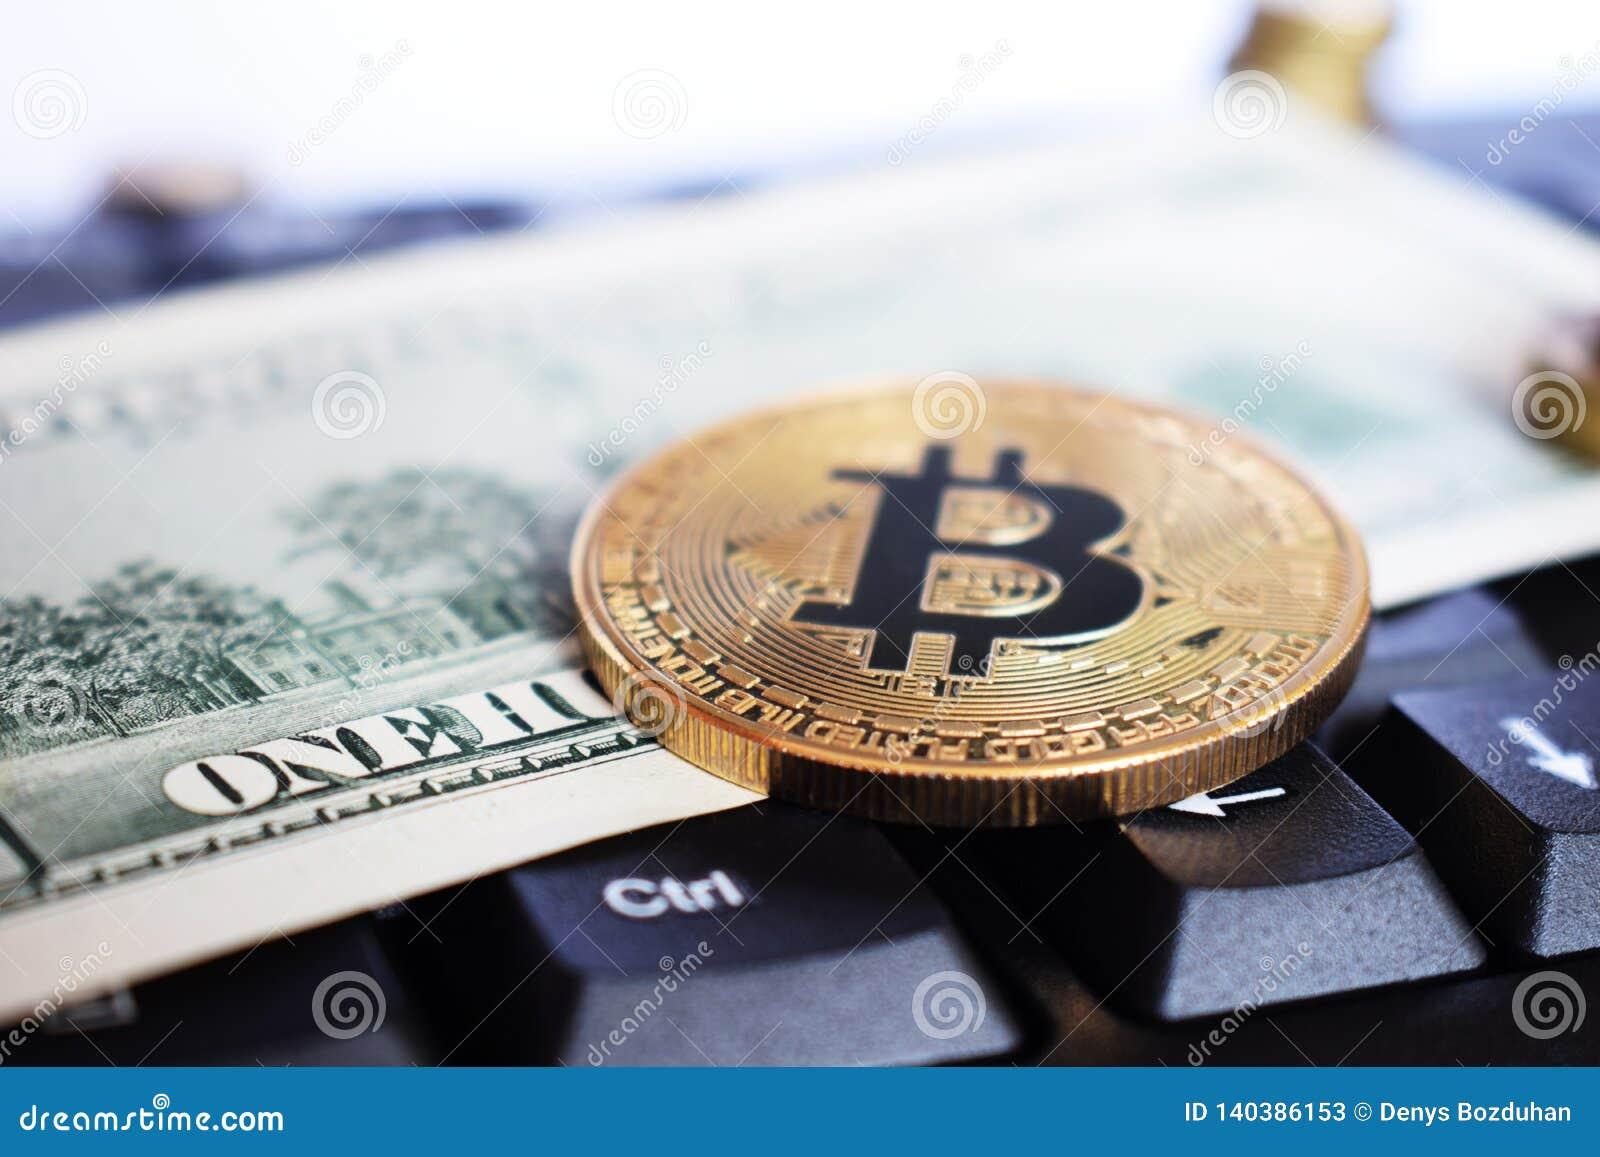 Bitcoin στο πληκτρολόγιο compuer στο υπόβαθρο, το σύμβολο των ηλεκτρονικών εικονικών χρημάτων και την έννοια cryptocurrency μεταλ